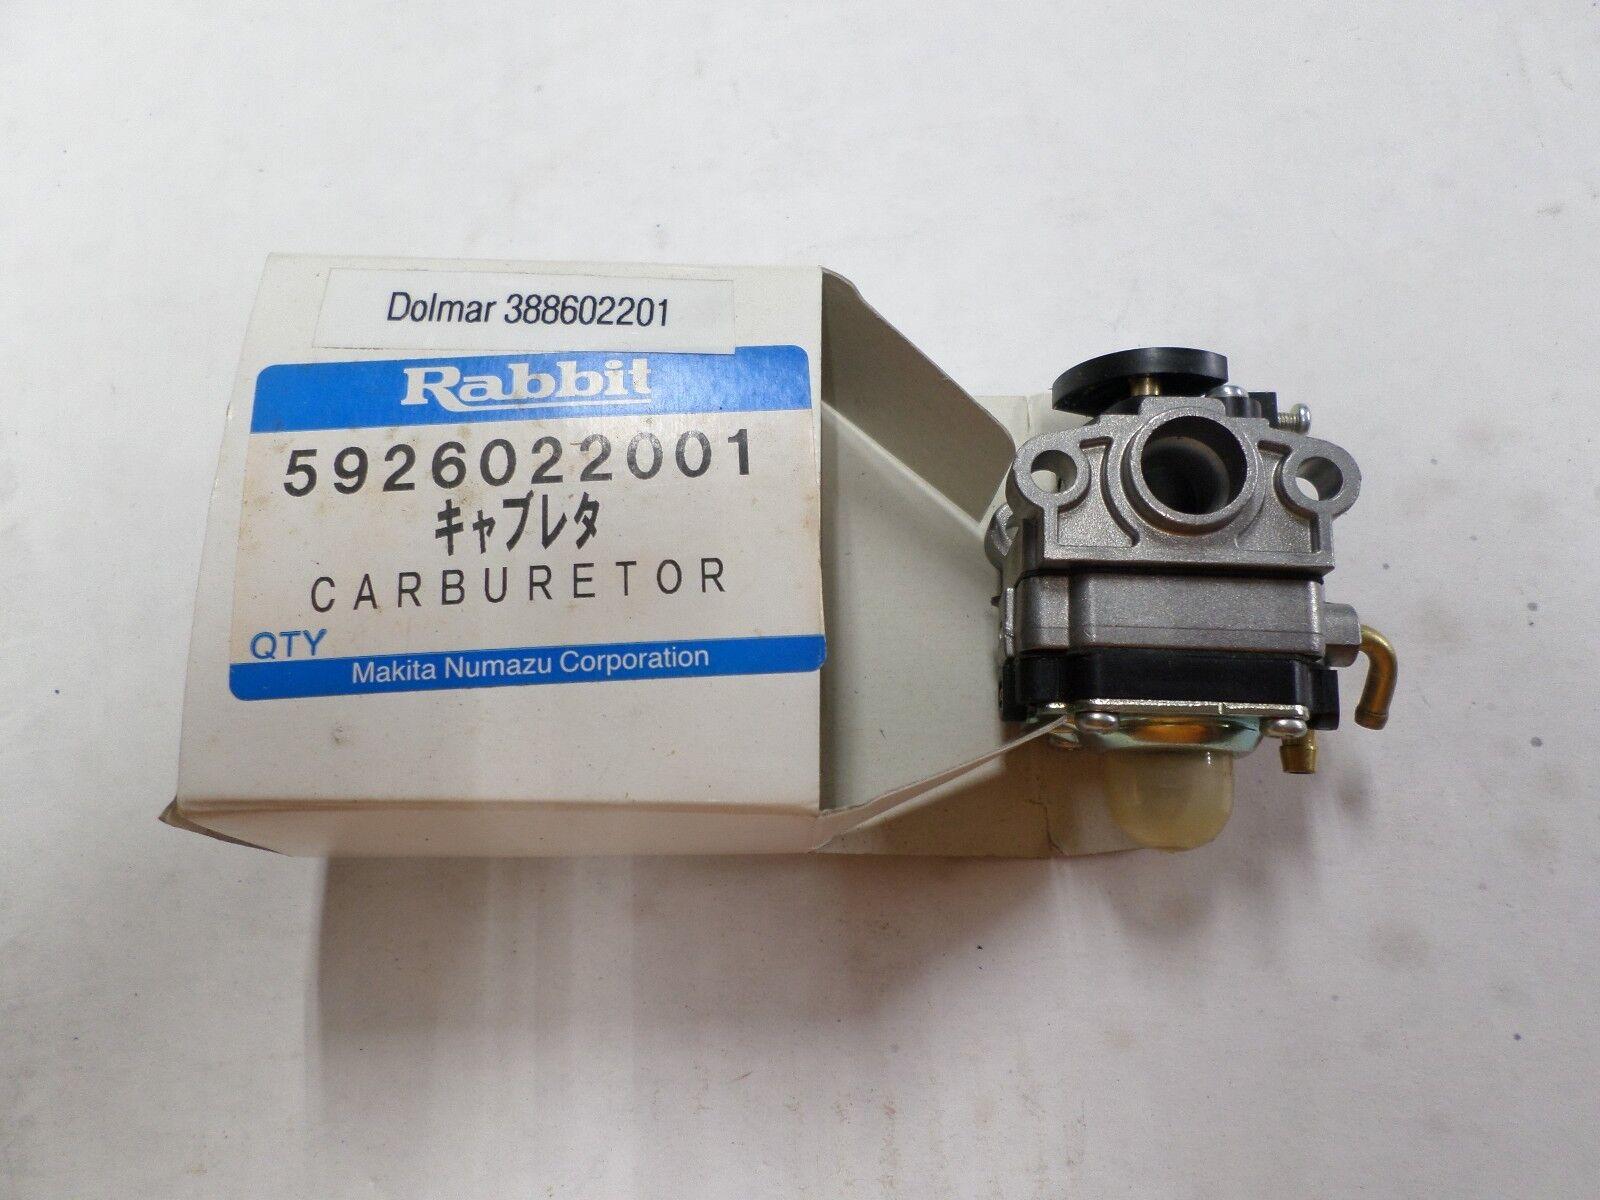 Original Makita Soplador Cocheburador para BHX2500 5926022001